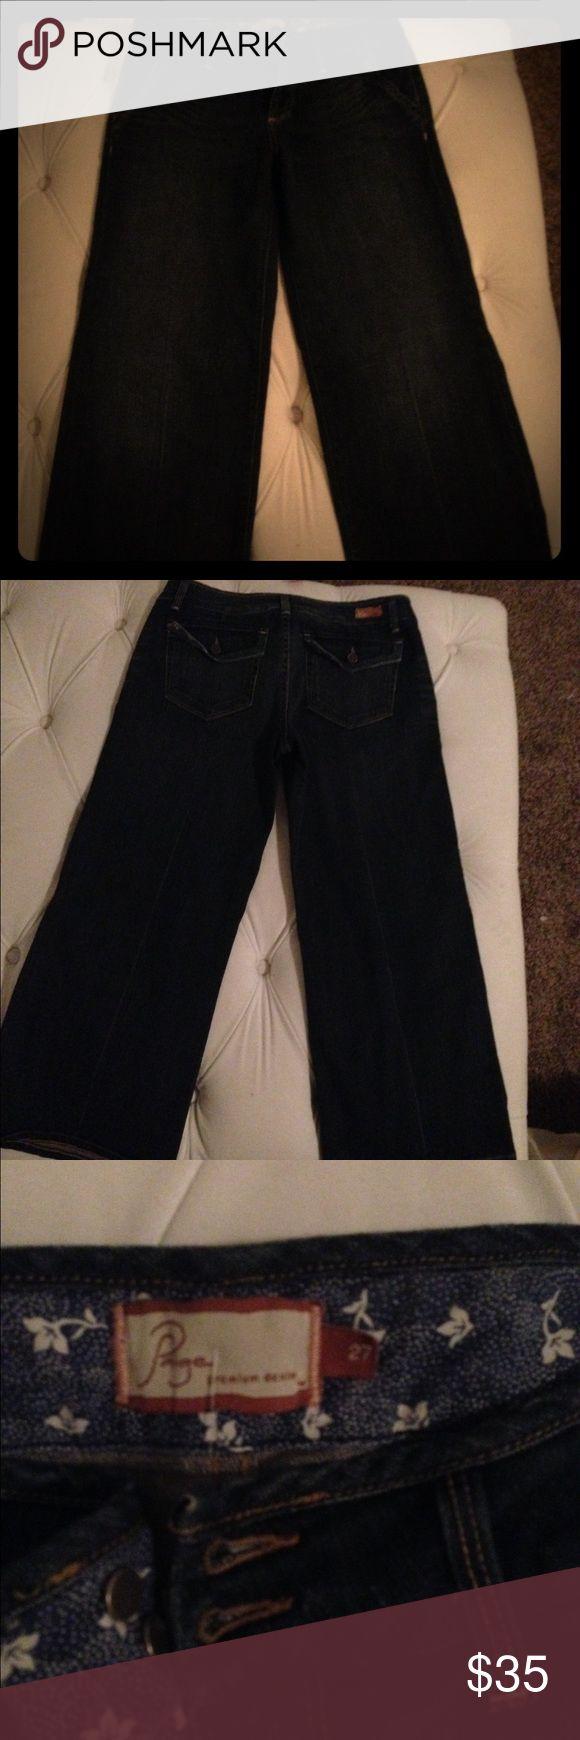 Paige Premium Denim capris 27 Paige premium denim Capri jeans. Wide flare leg, very cute. Button pockets on the back to accentuate curves. Size 27. Like new condition. Paige Jeans Jeans Flare & Wide Leg